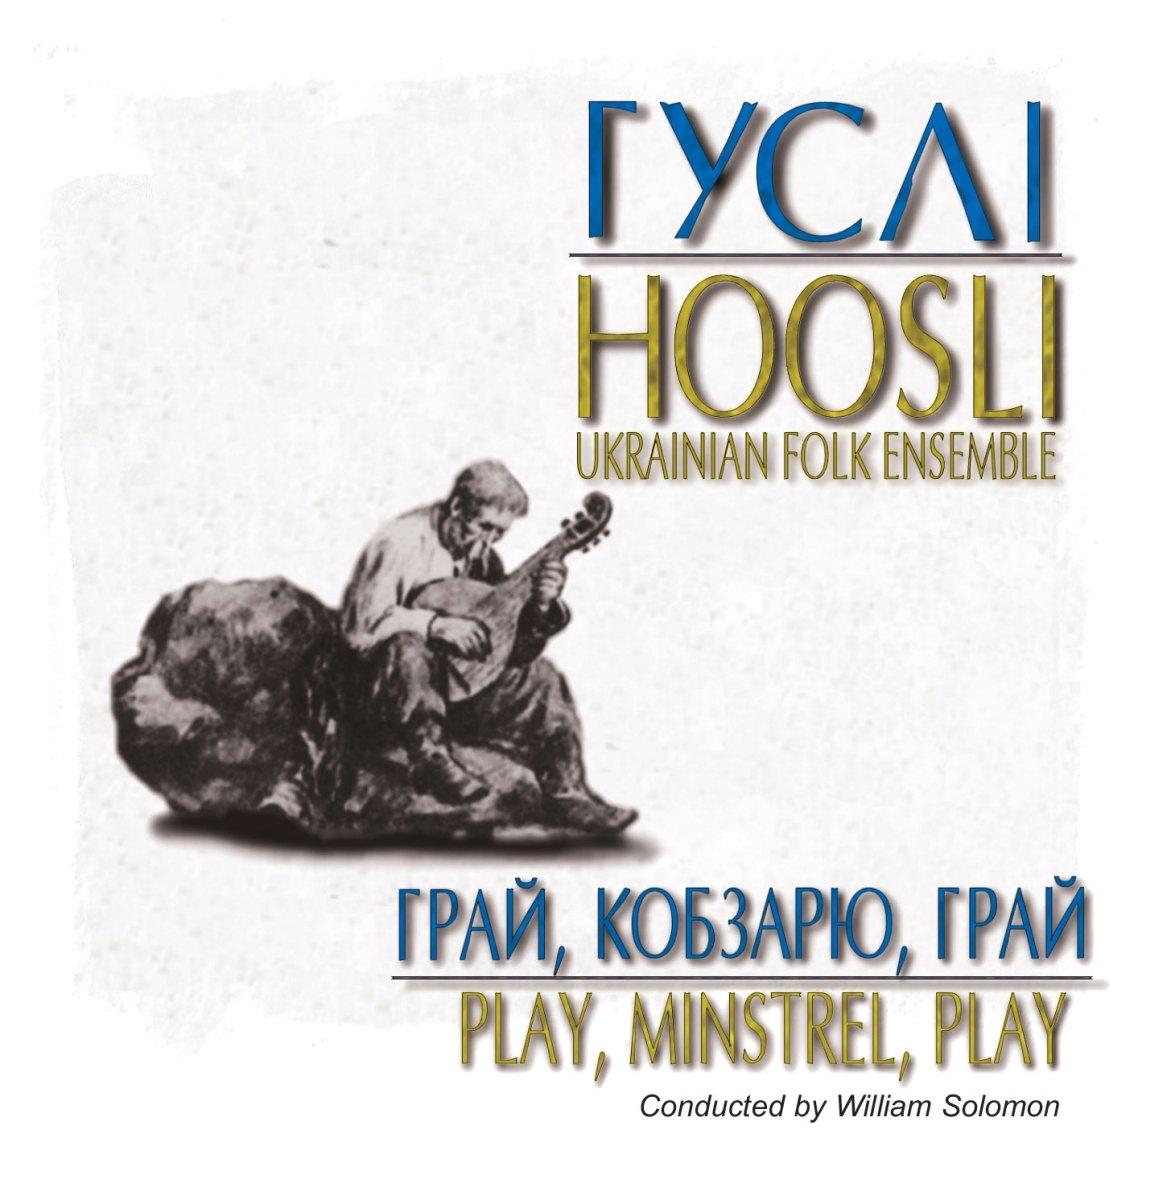 Play Minstrel Play - Hoosli